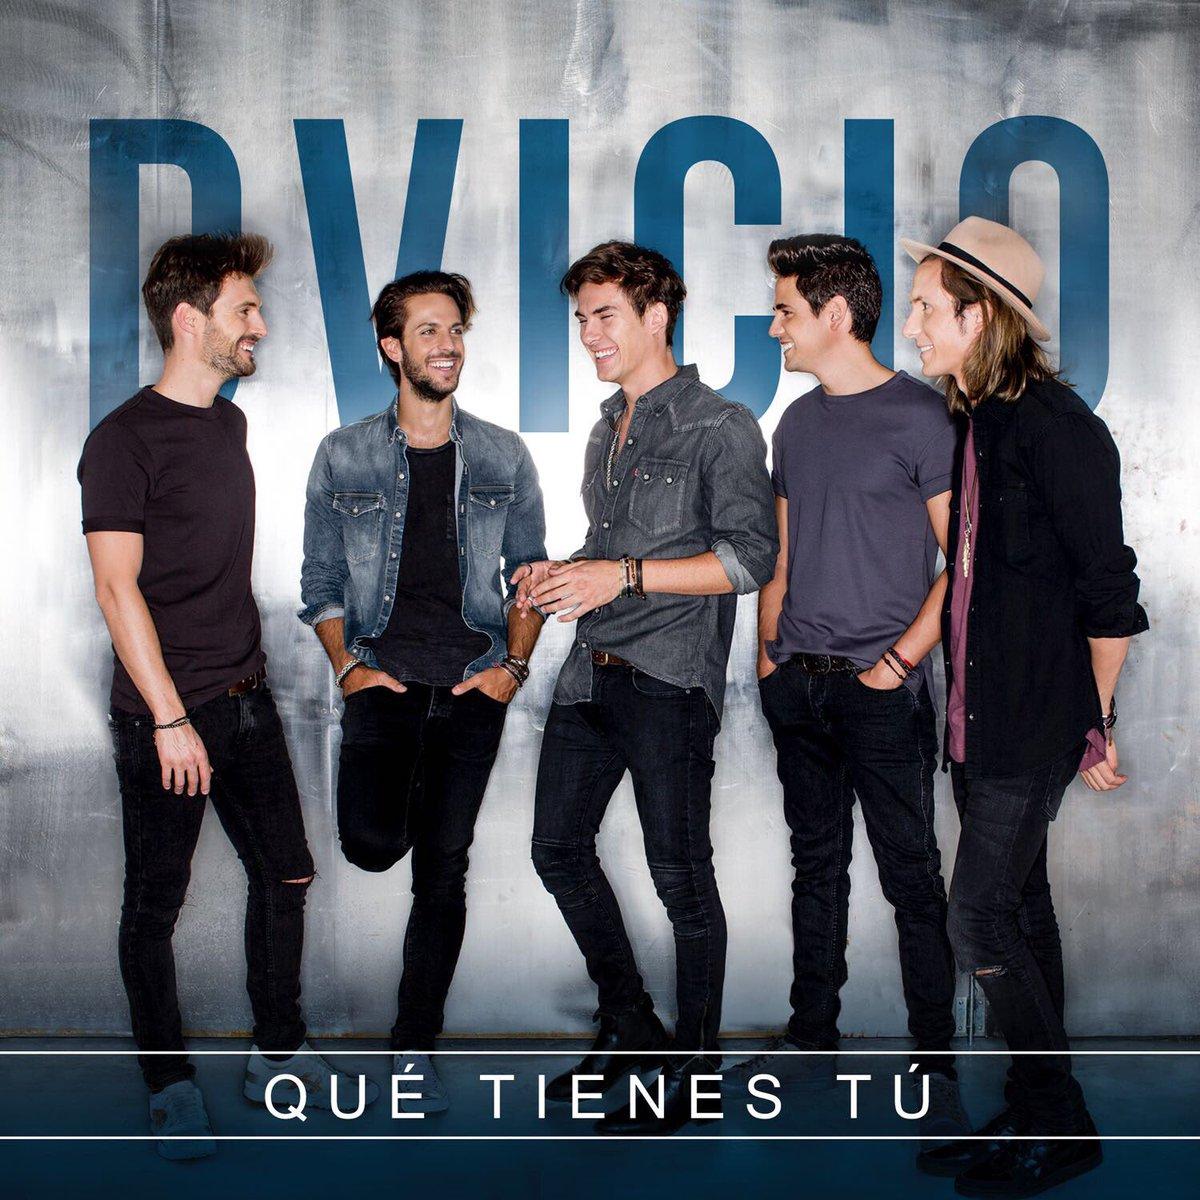 test Twitter Media - Os presentamos QUÉ TIENES TÚ, mañana podréis reservar disco firmado!  Here is the cover of our new album QUÉ TIENES TÚ, preorder tomorrow!! https://t.co/2VxMYCG8SA